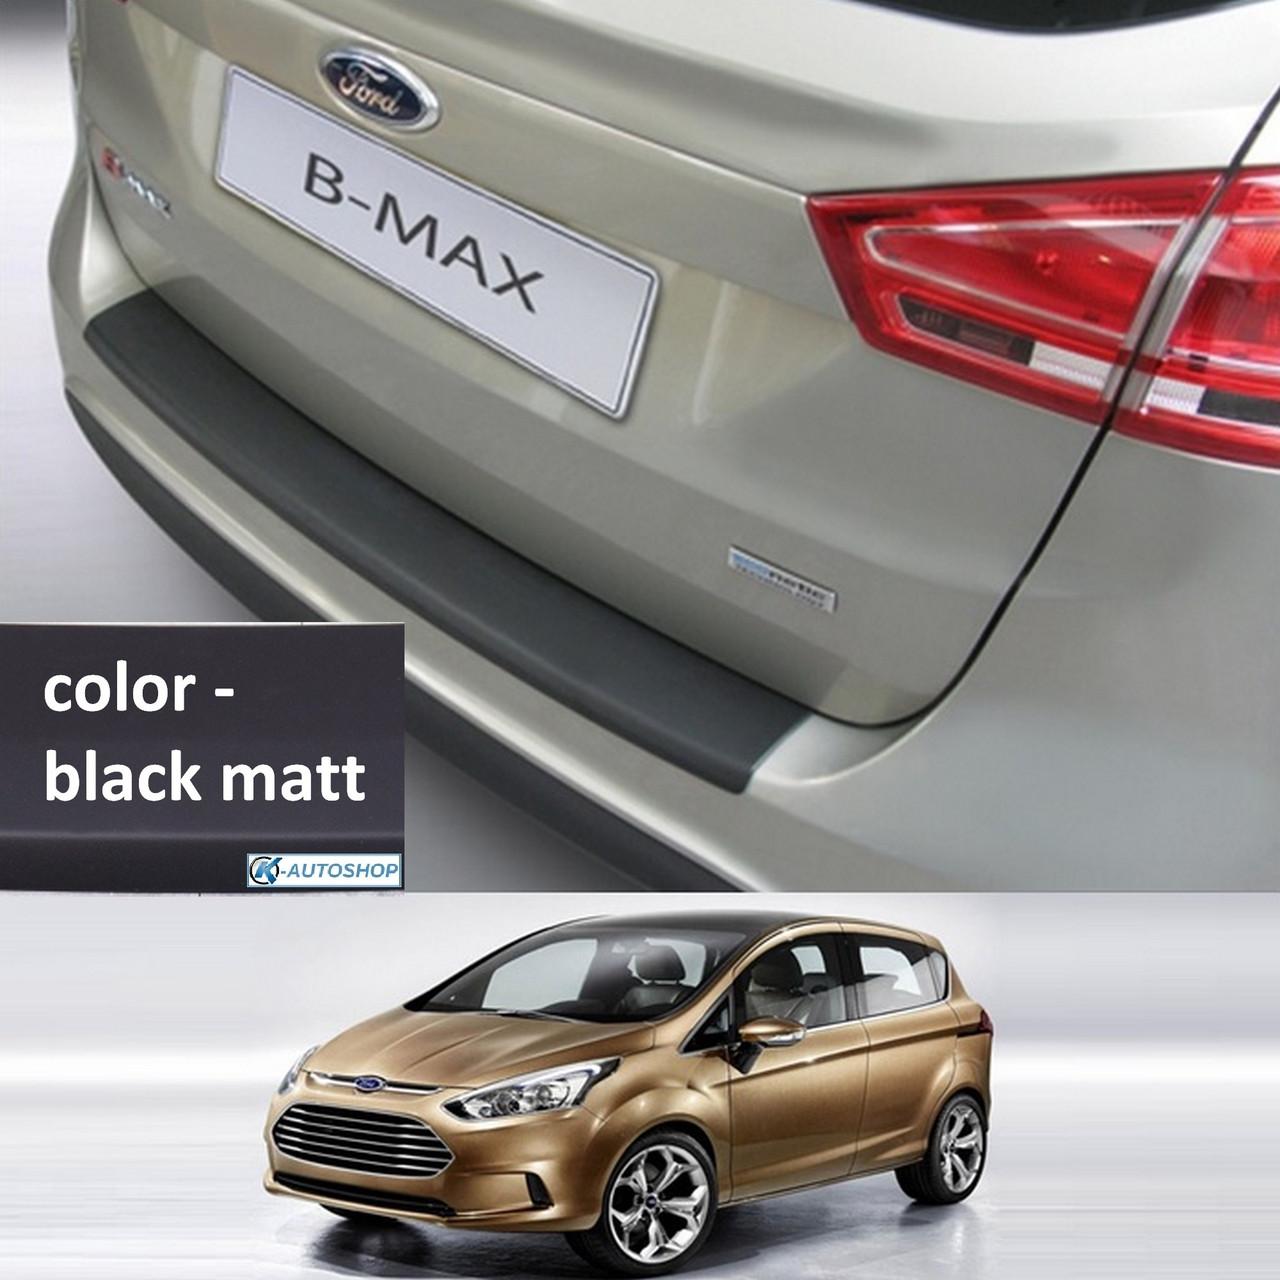 Ford B-Max 2012-2017 пластиковая накладка заднего бампера